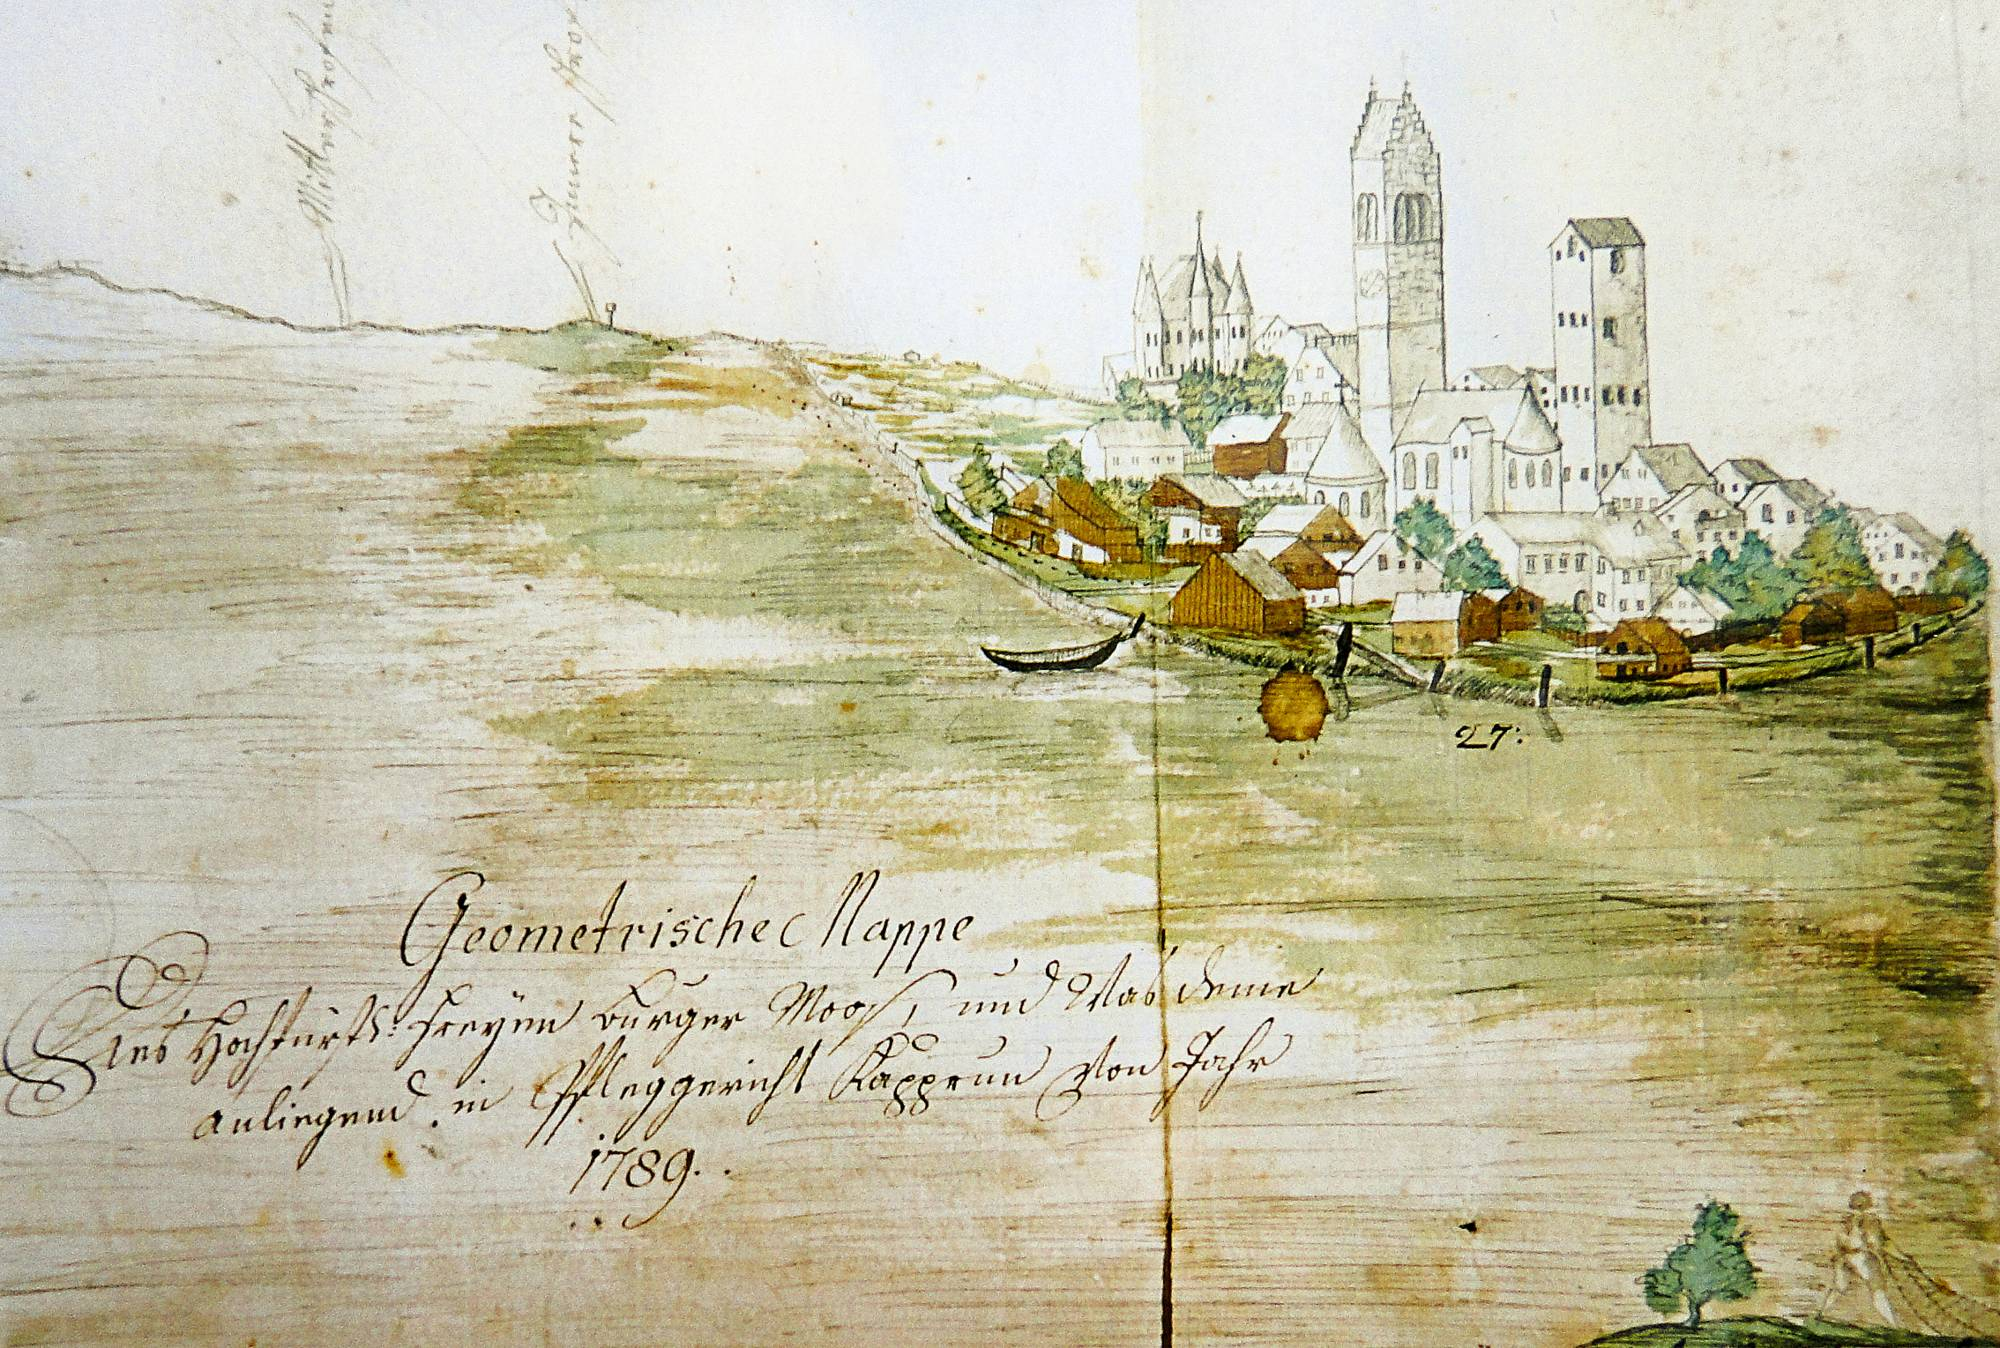 1789: Ensemble Rosenberg Castle, parish church and Vogtturm